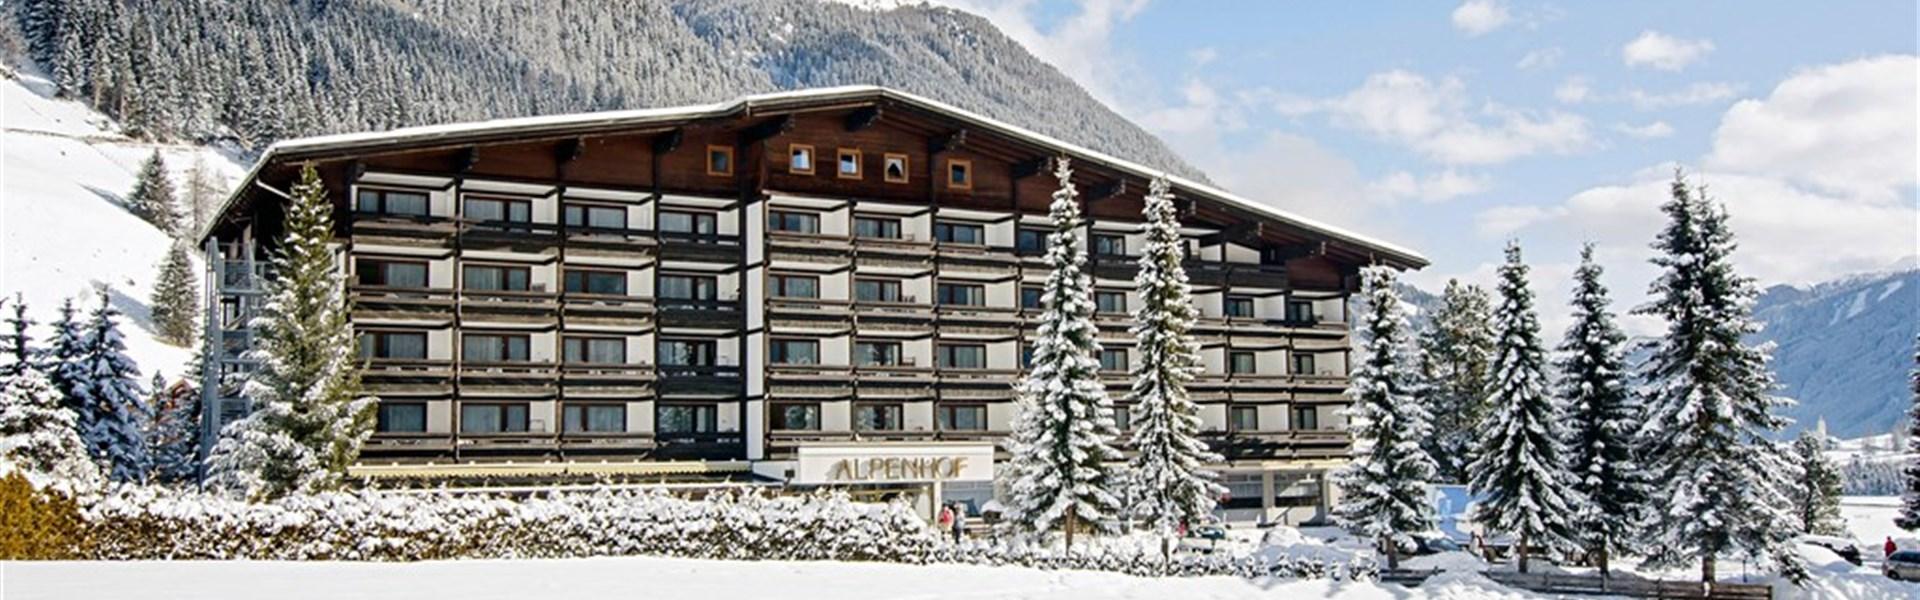 Hotel Alpenhof W22 -